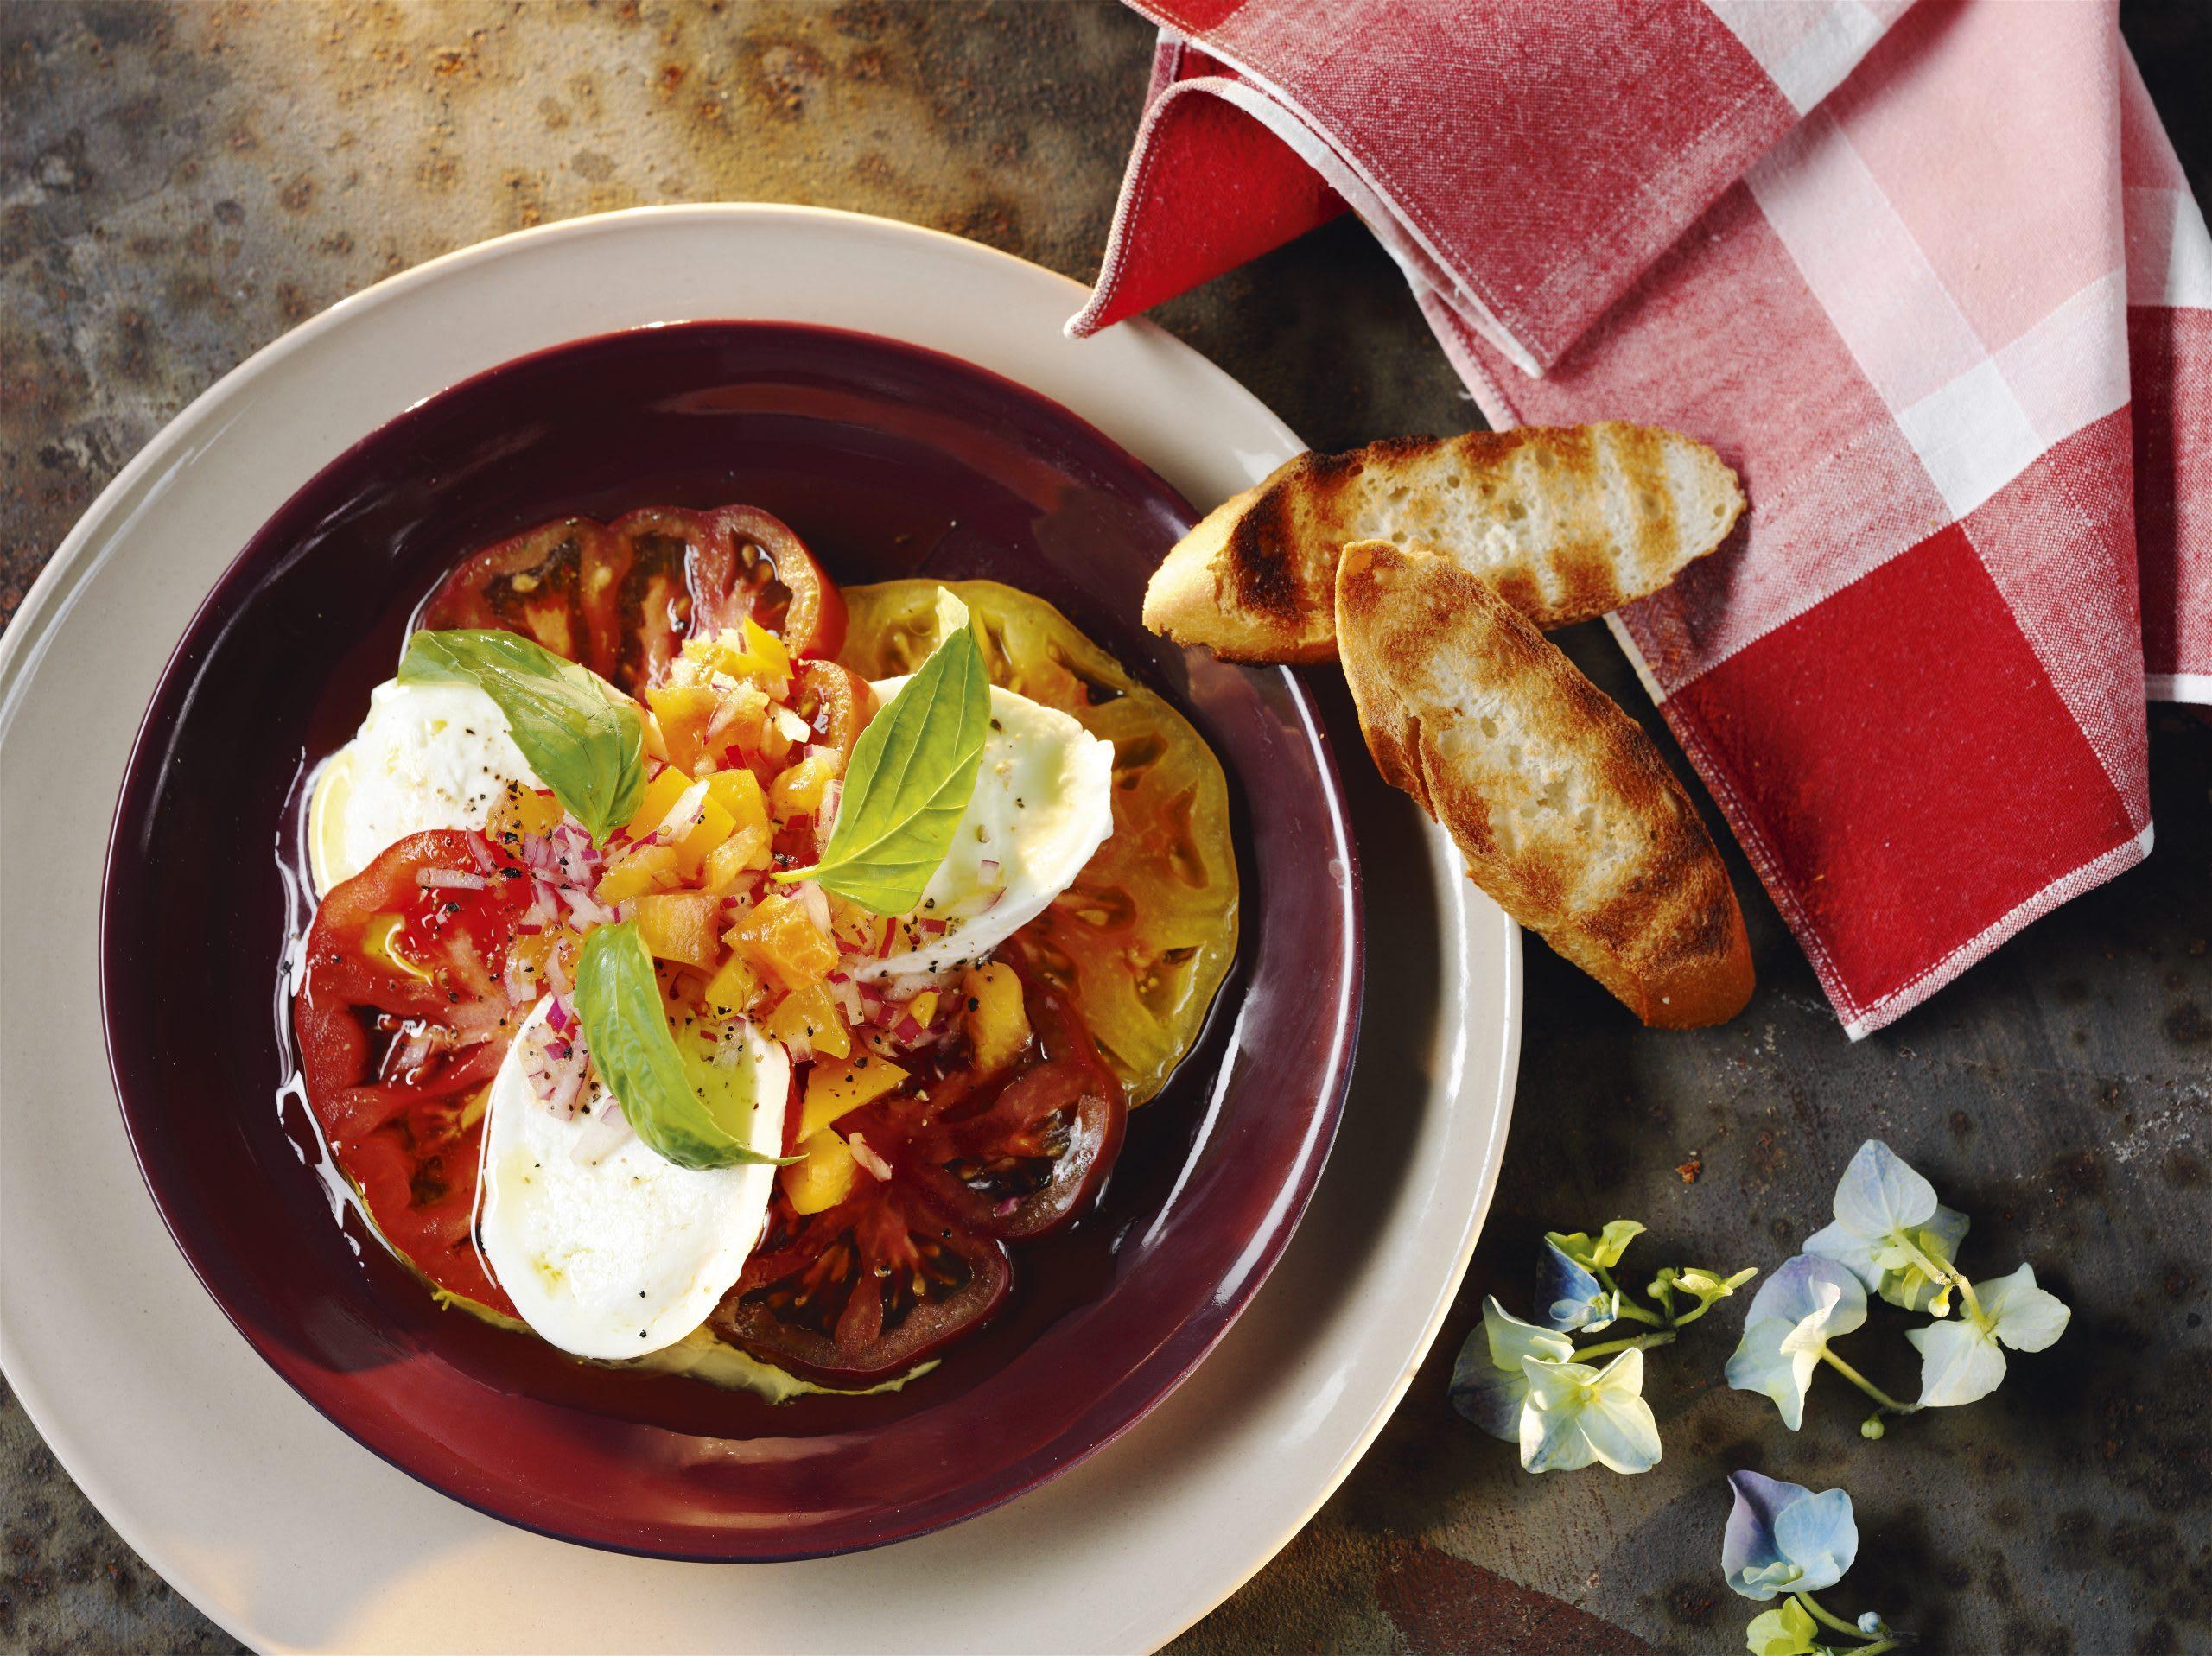 Tomaten-Mozzarella-Salat mit Pfirsich-Dressing